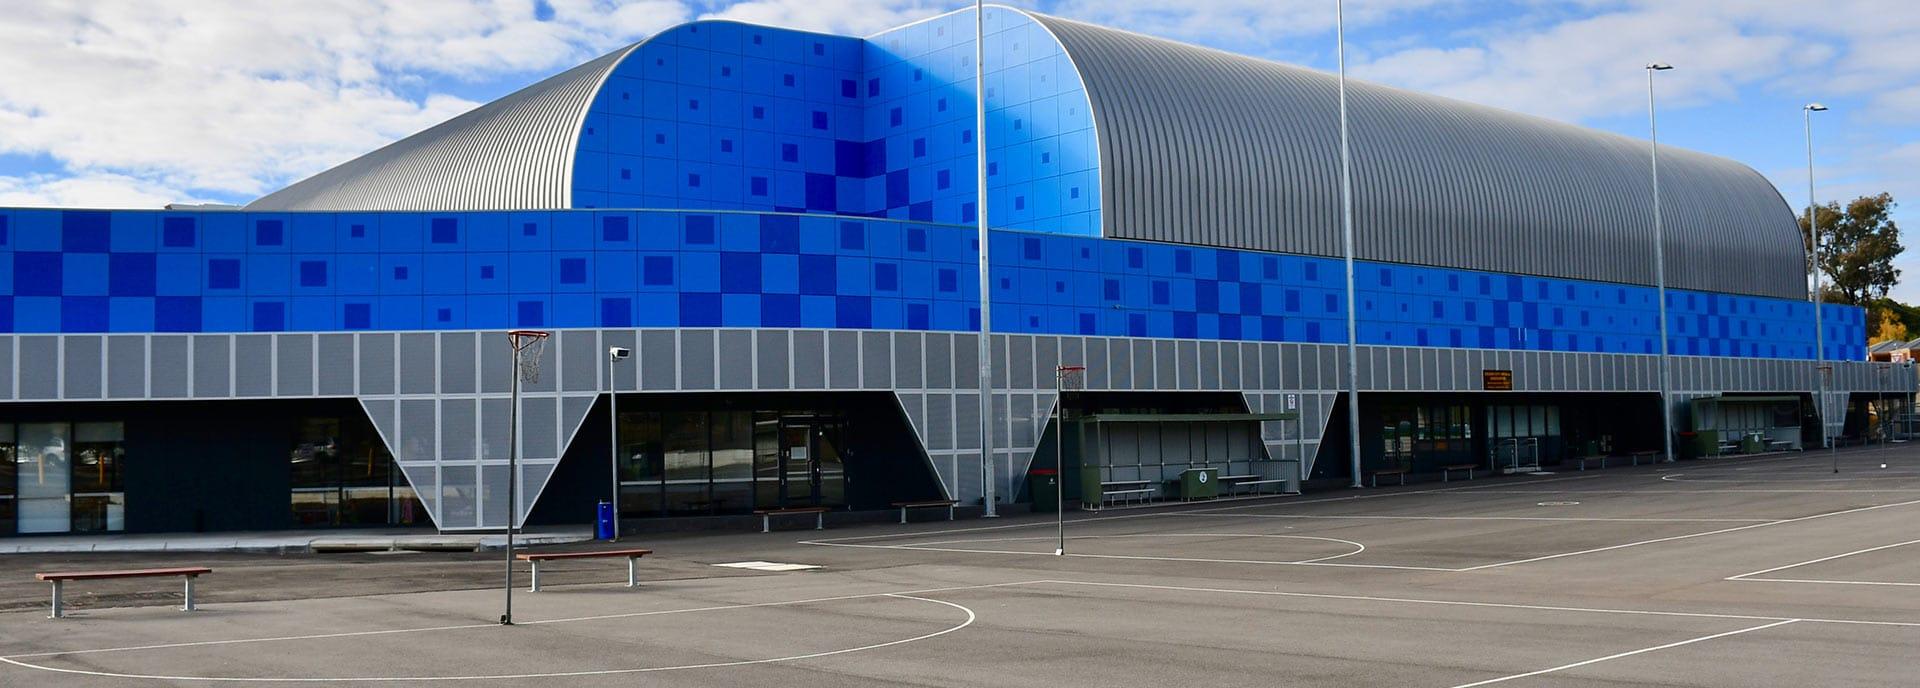 banner-stadium2